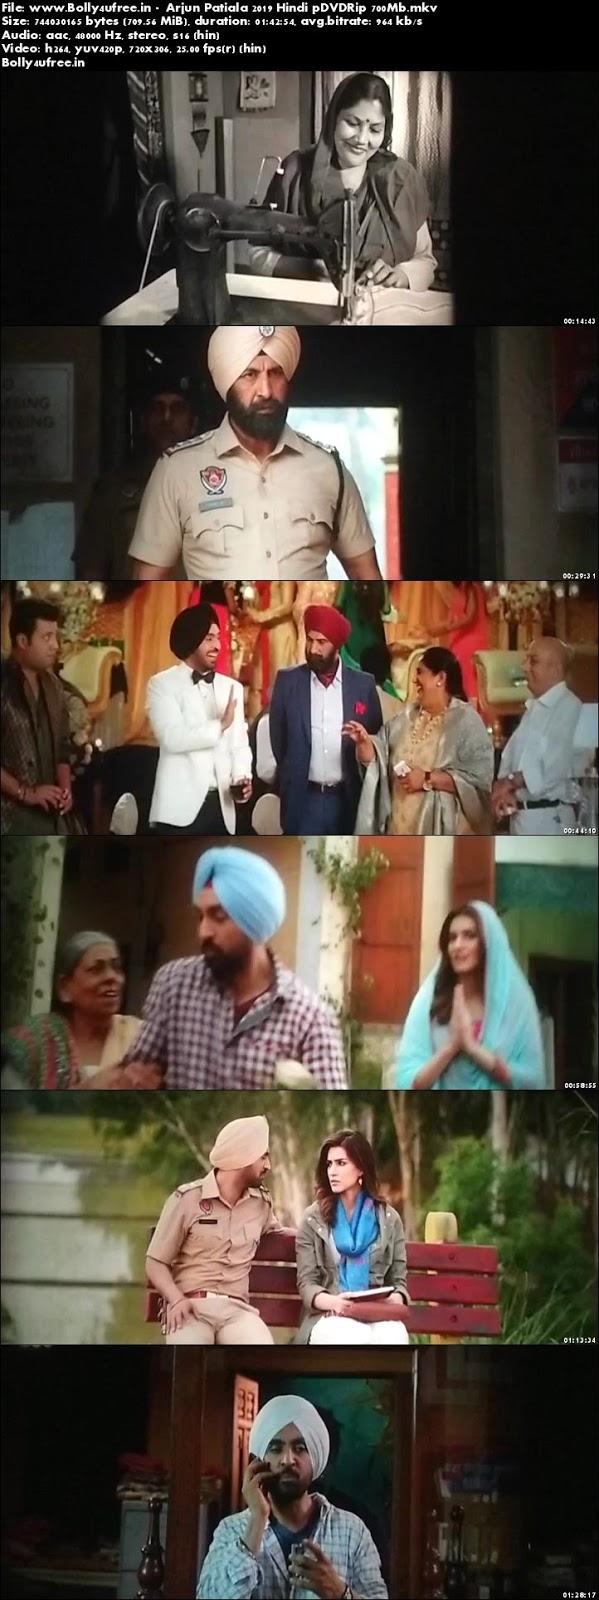 Arjun Patiala 2019 Hindi pDVDRip 700Mb x264 Bolly4ufree.in